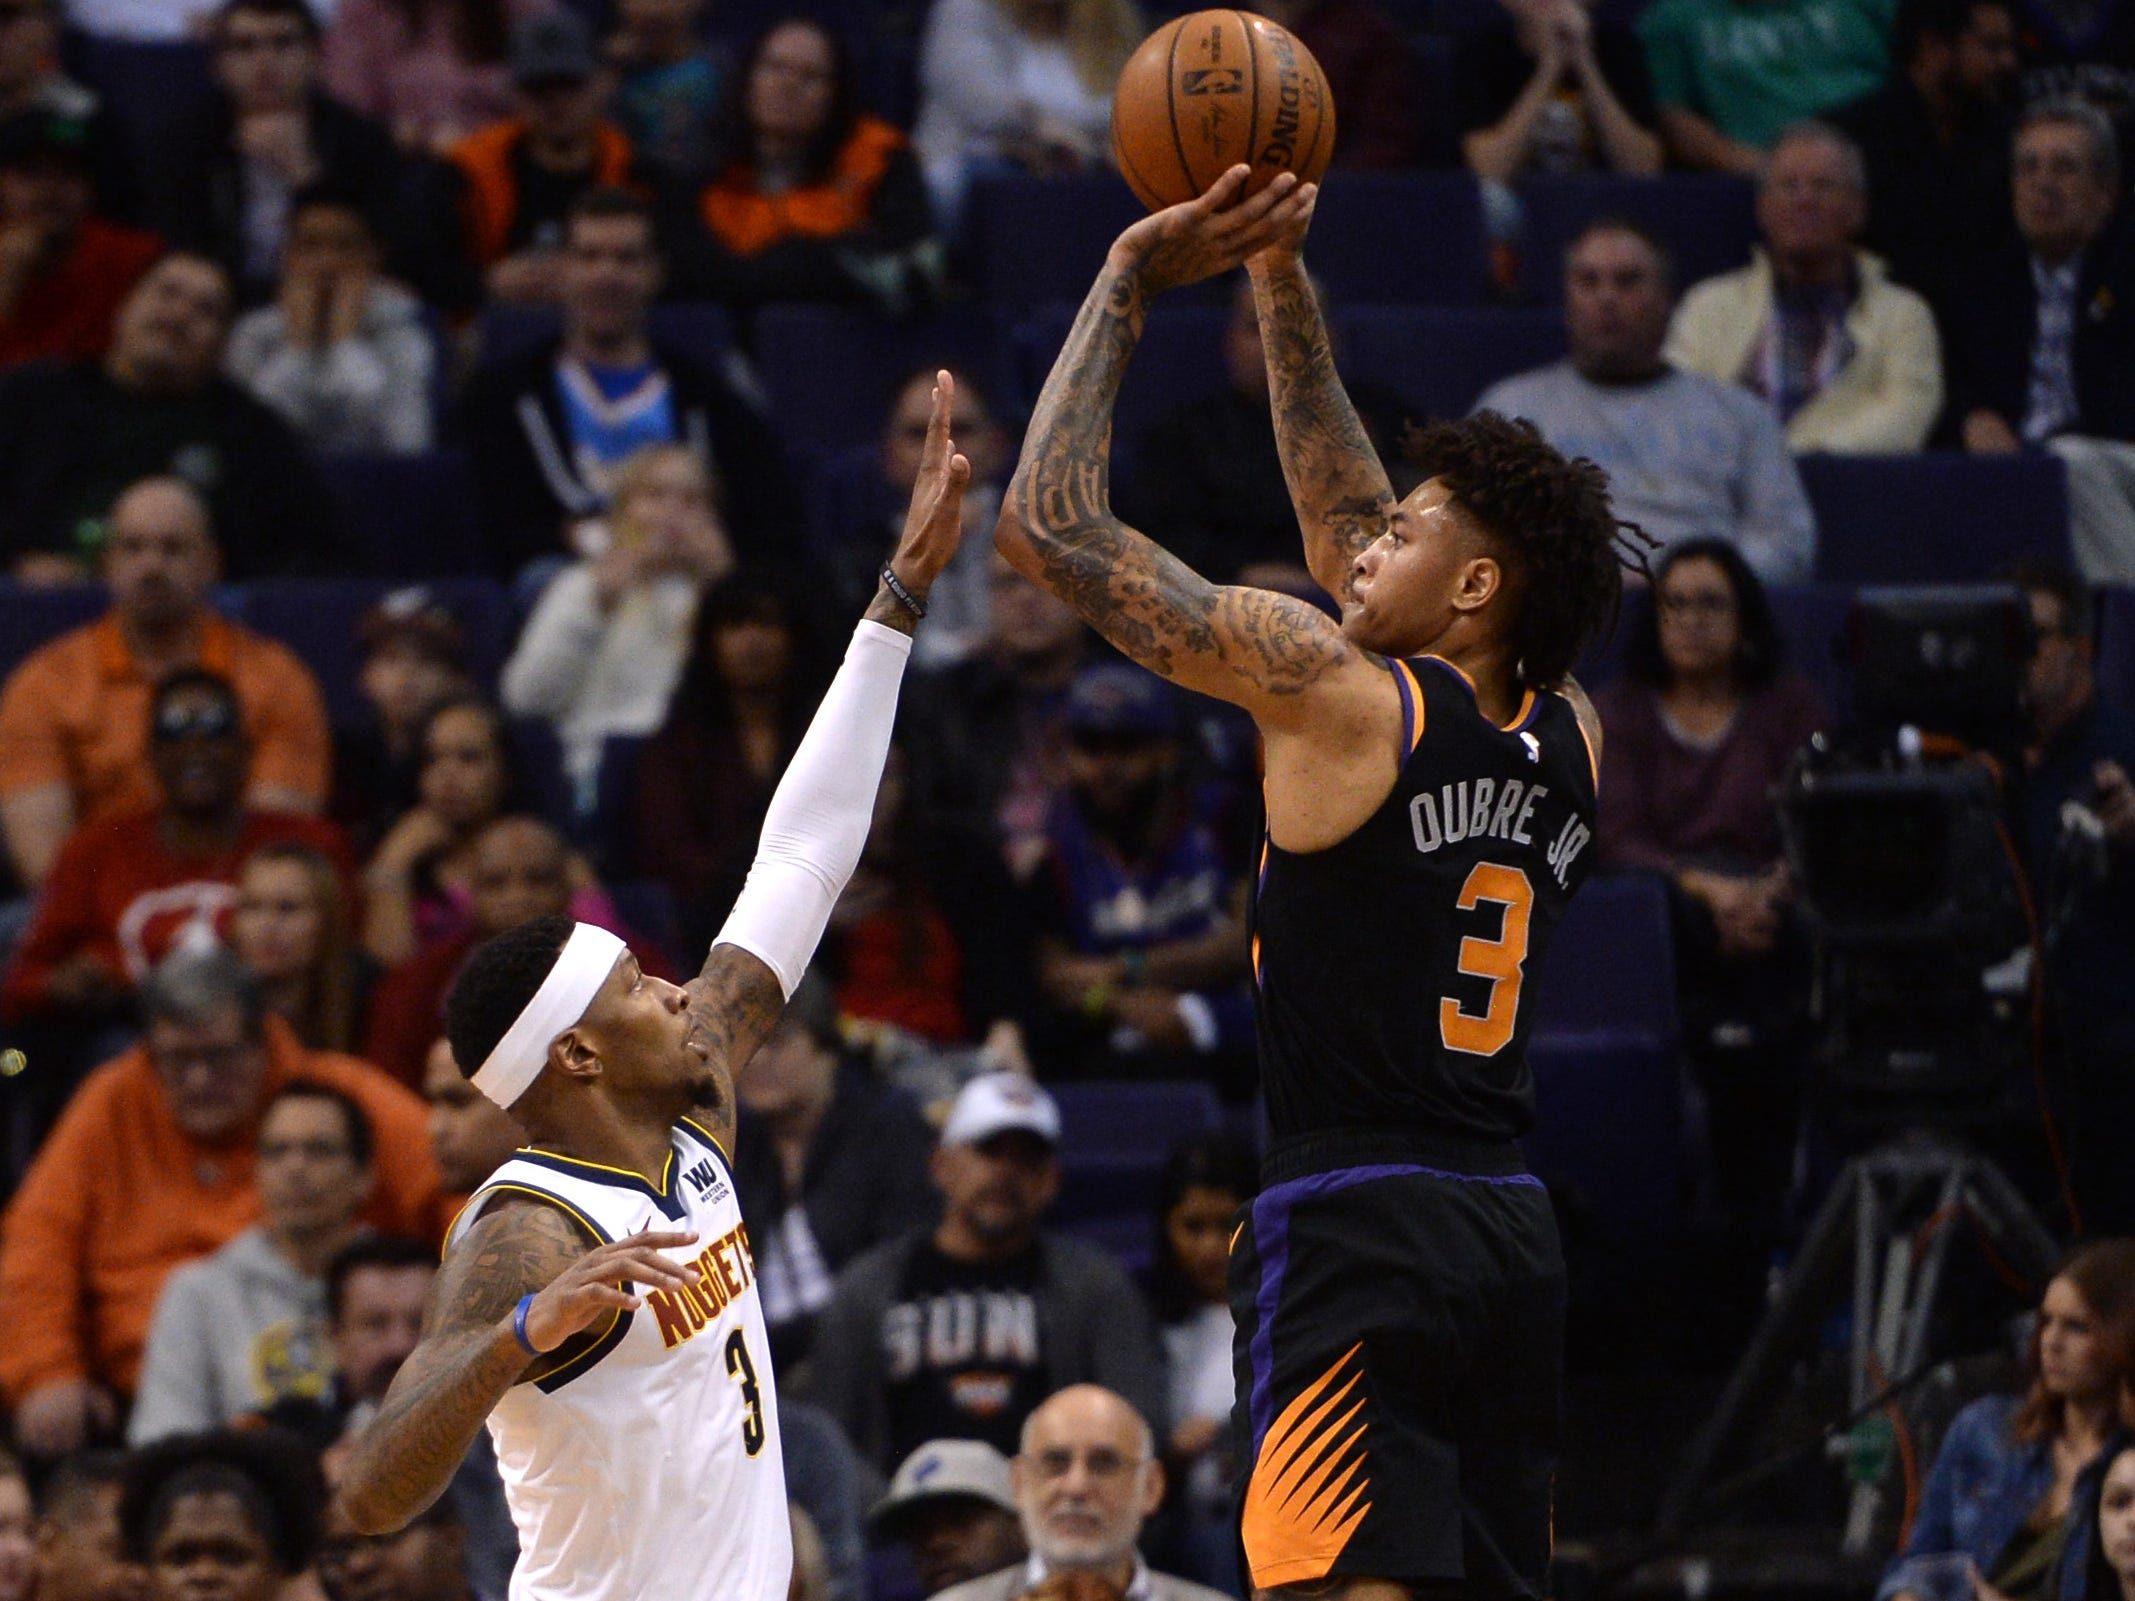 Jan 12, 2019; Phoenix, AZ, USA; Phoenix Suns forward Kelly Oubre Jr. (3) shoots over Denver Nuggets forward Torrey Craig (3). (Joe Camporeale-USA TODAY Sports)